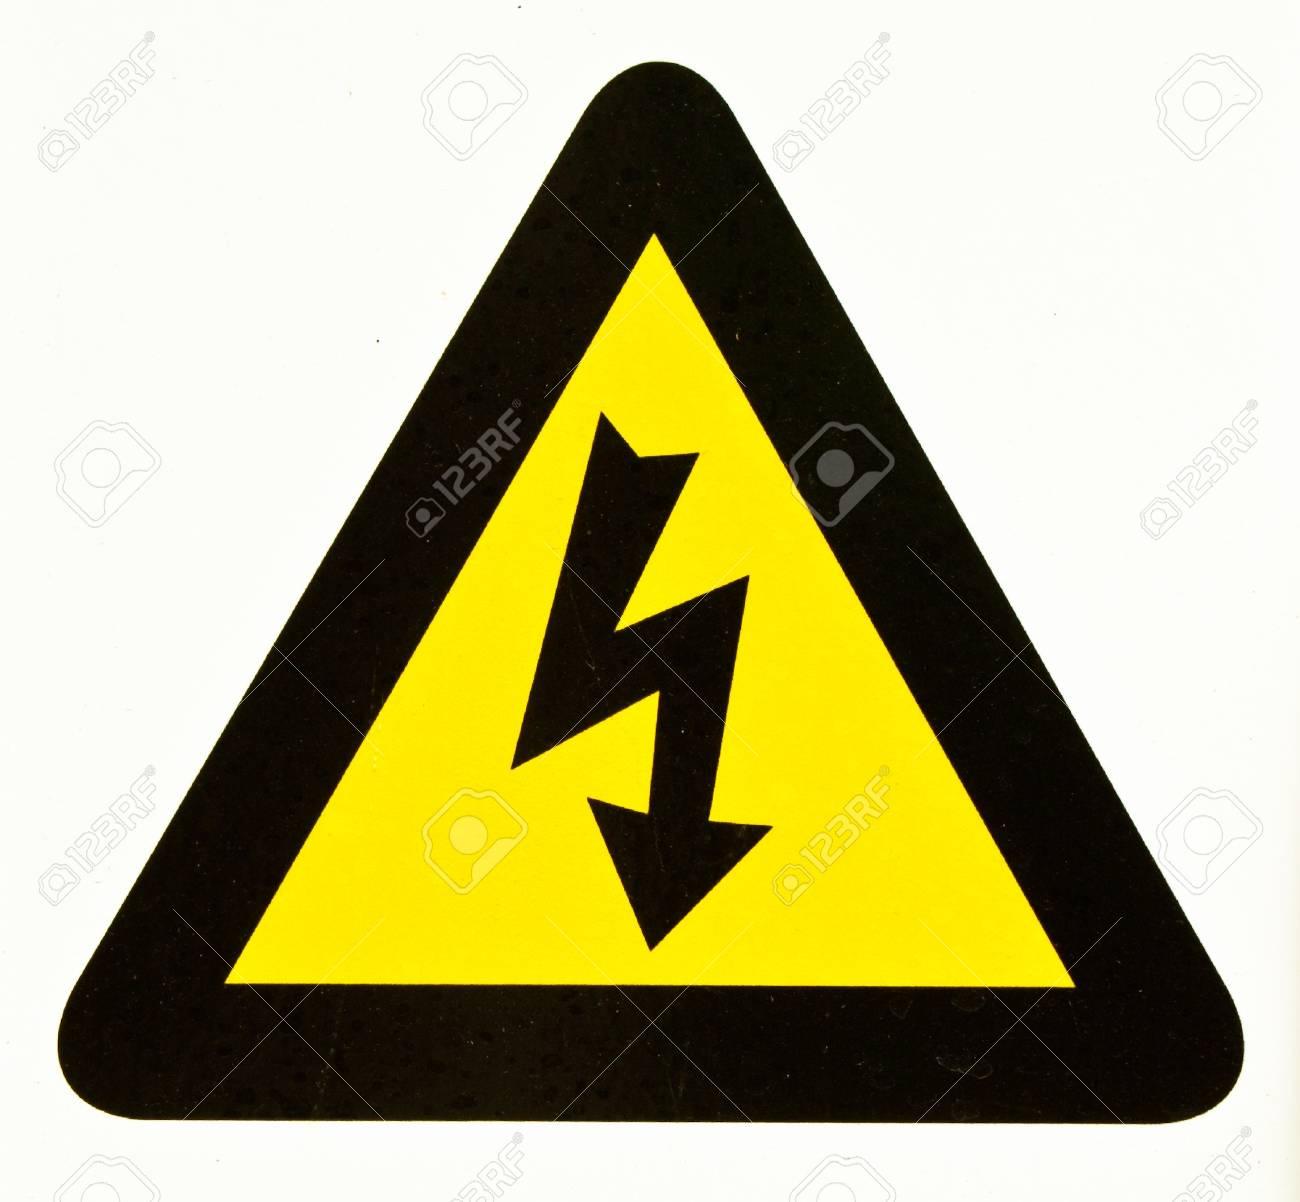 danger high voltage Stock Photo - 7702814